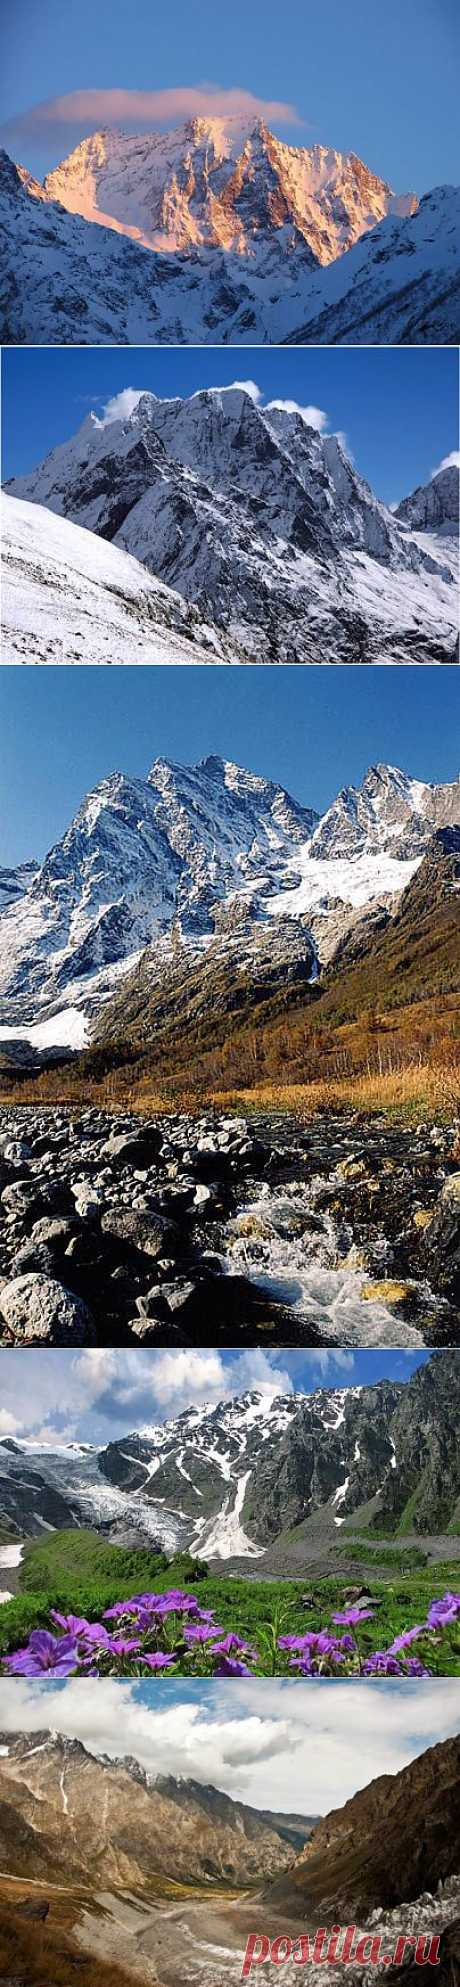 ¡(+1) - los lugares Asombrosos de Rusia! | ASOMBROSO